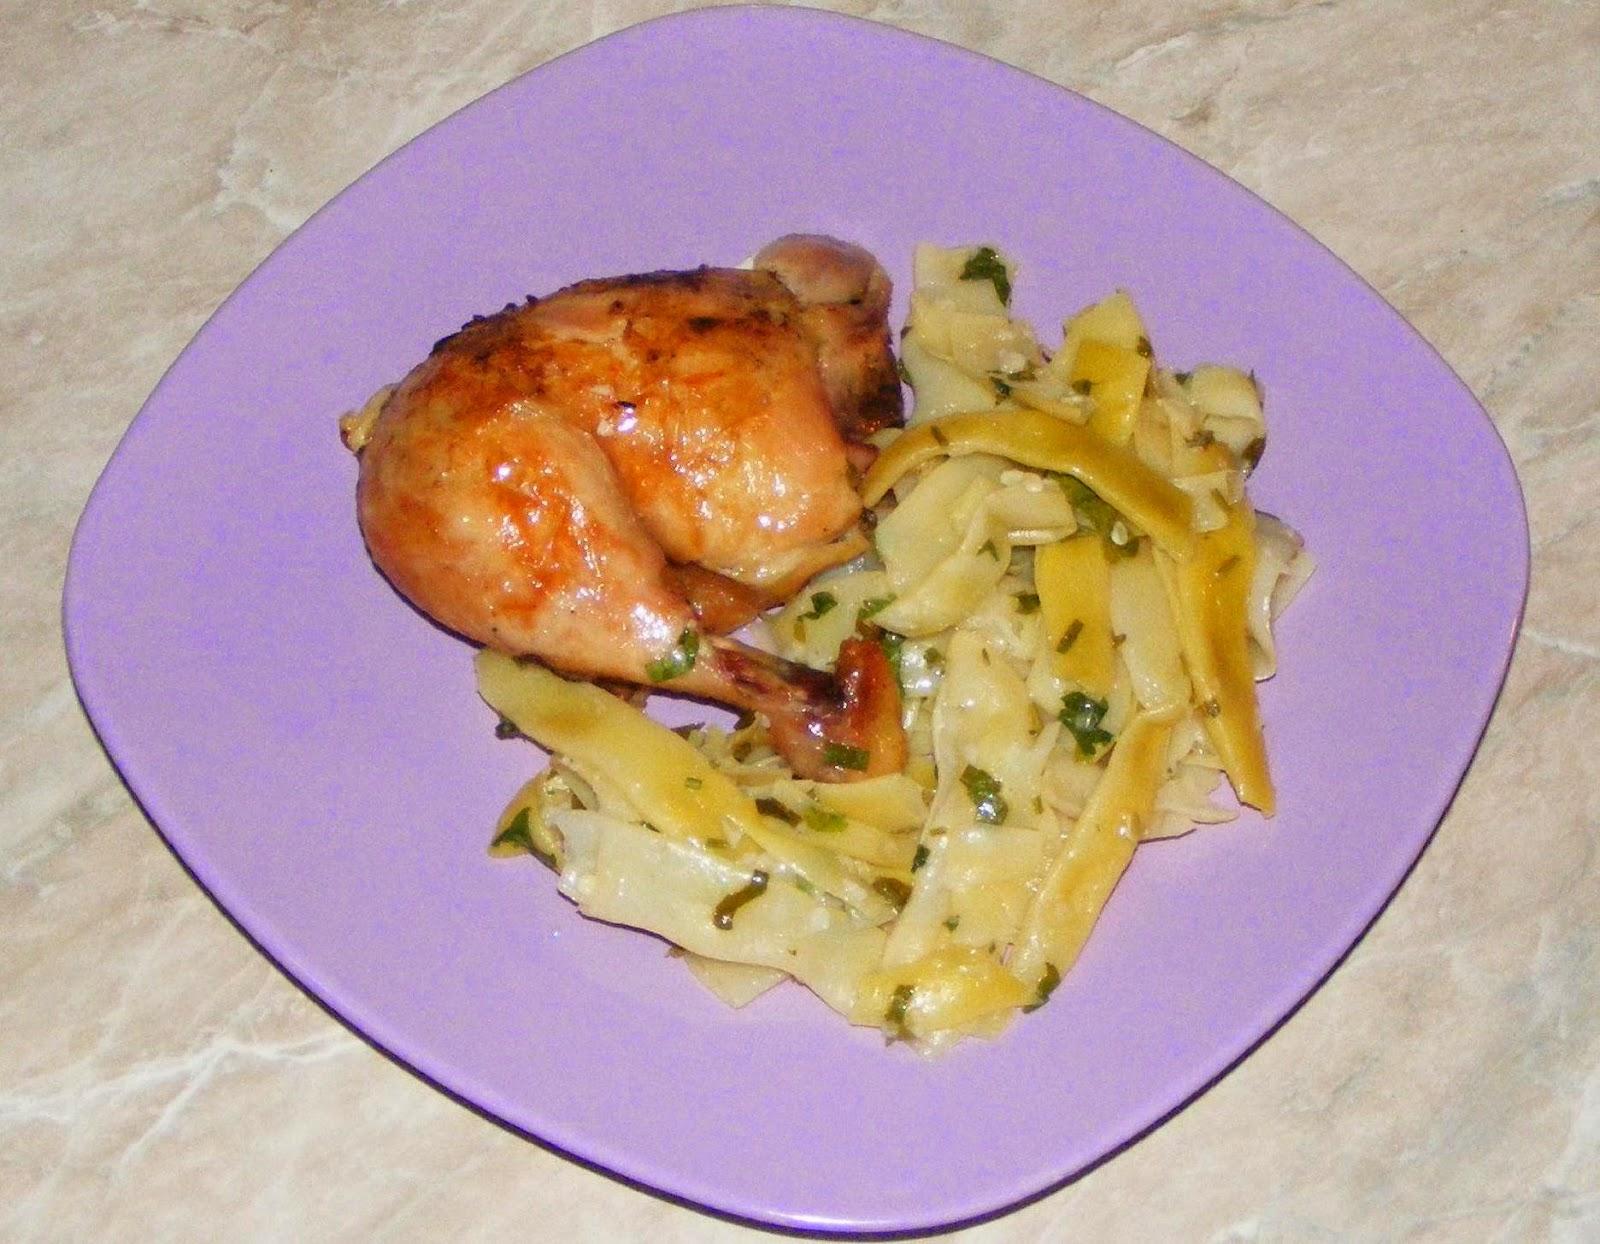 friptura de pui la cuptor cu o garnitura de salata de fasole verde, retete si preparate culinare cu carne de pui, retete si preparate culinare cu fasole verde pastai, retete de mancare, retete mancare, retete culinare,